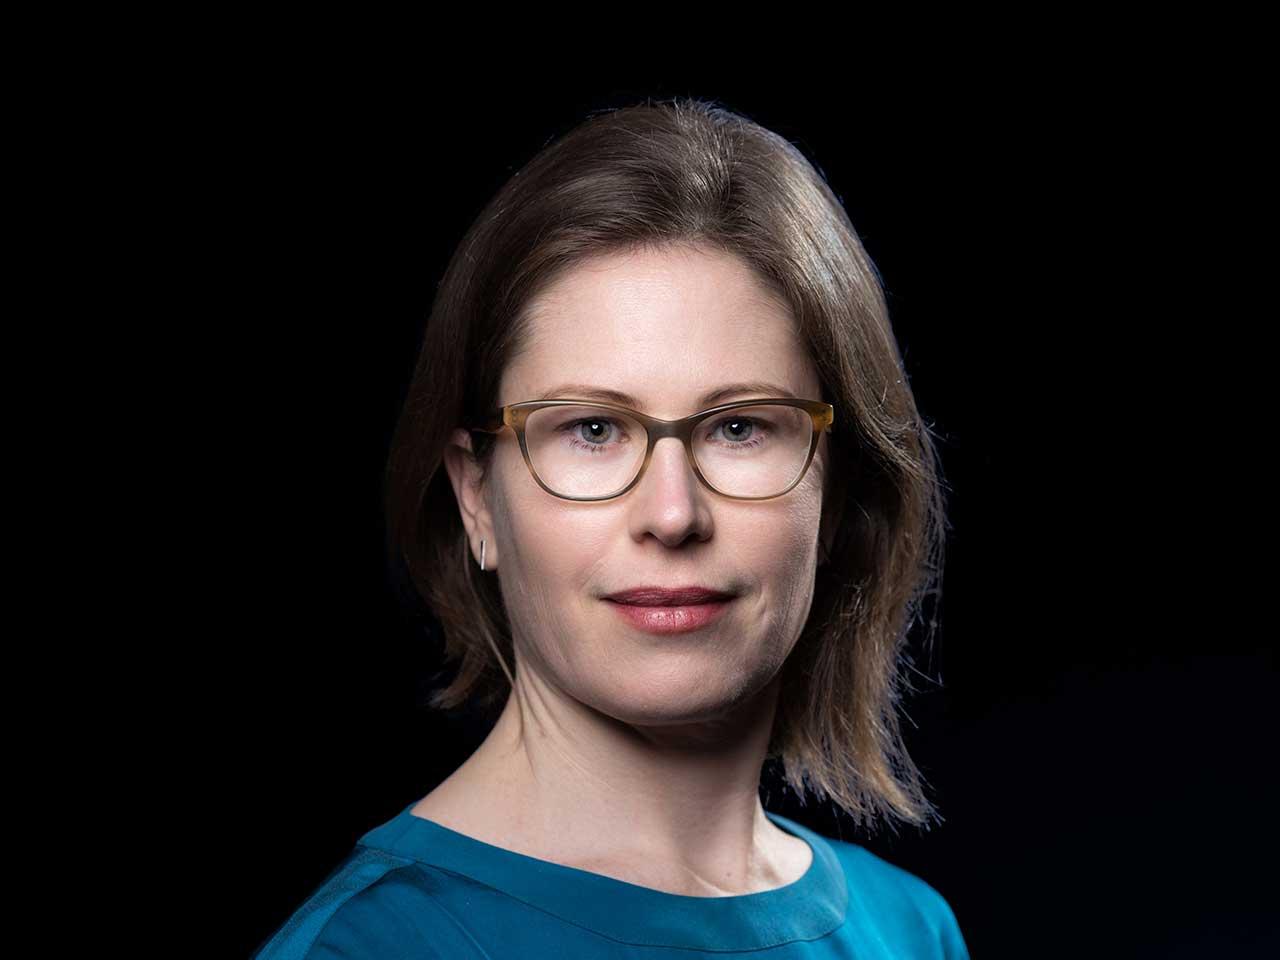 Jessica Tollkuhn